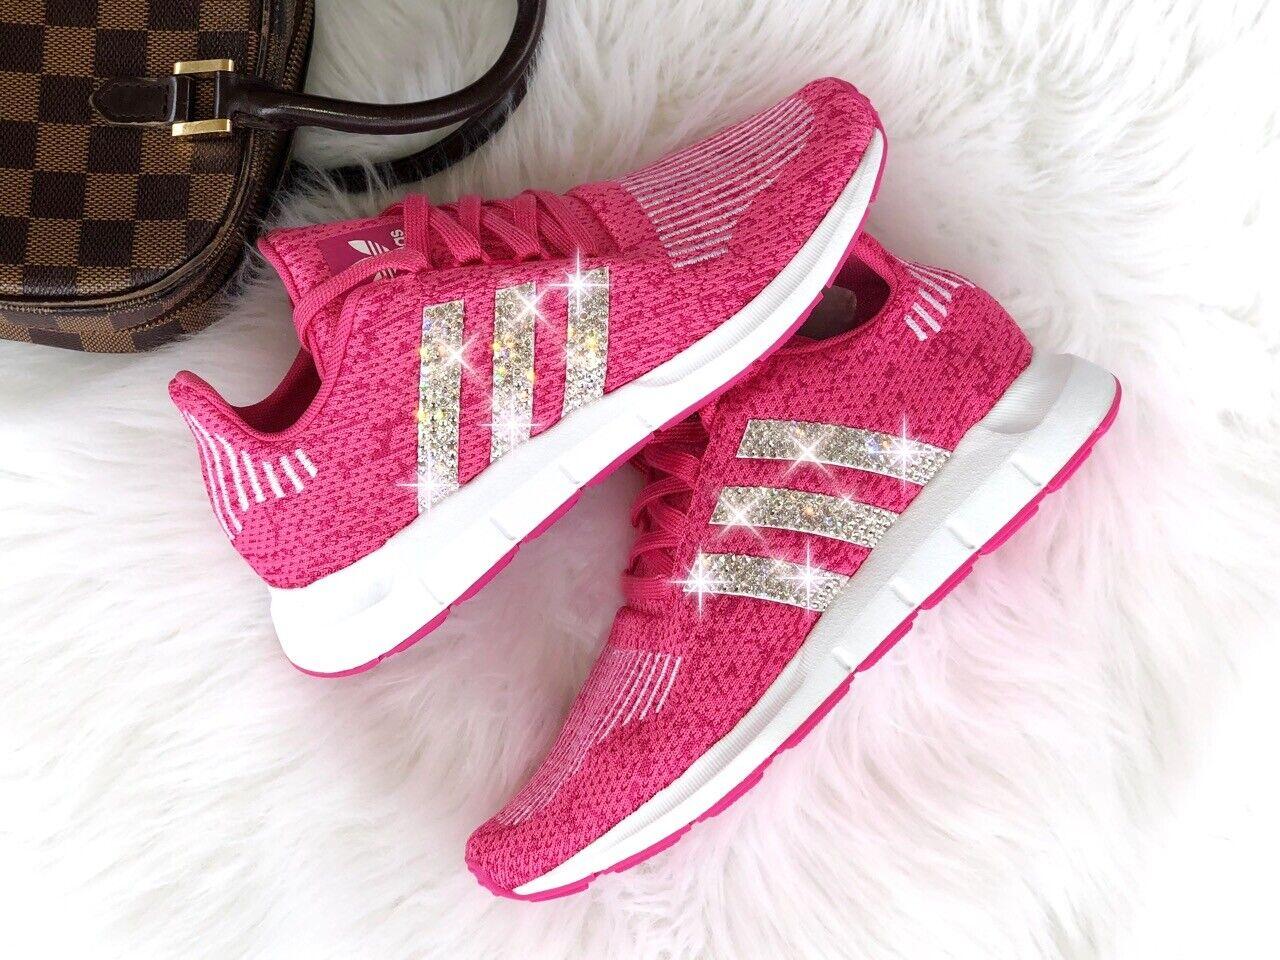 Crystal Adidas Swift Run J Luxus Sneakers mit Swarovski Elements pink   pink